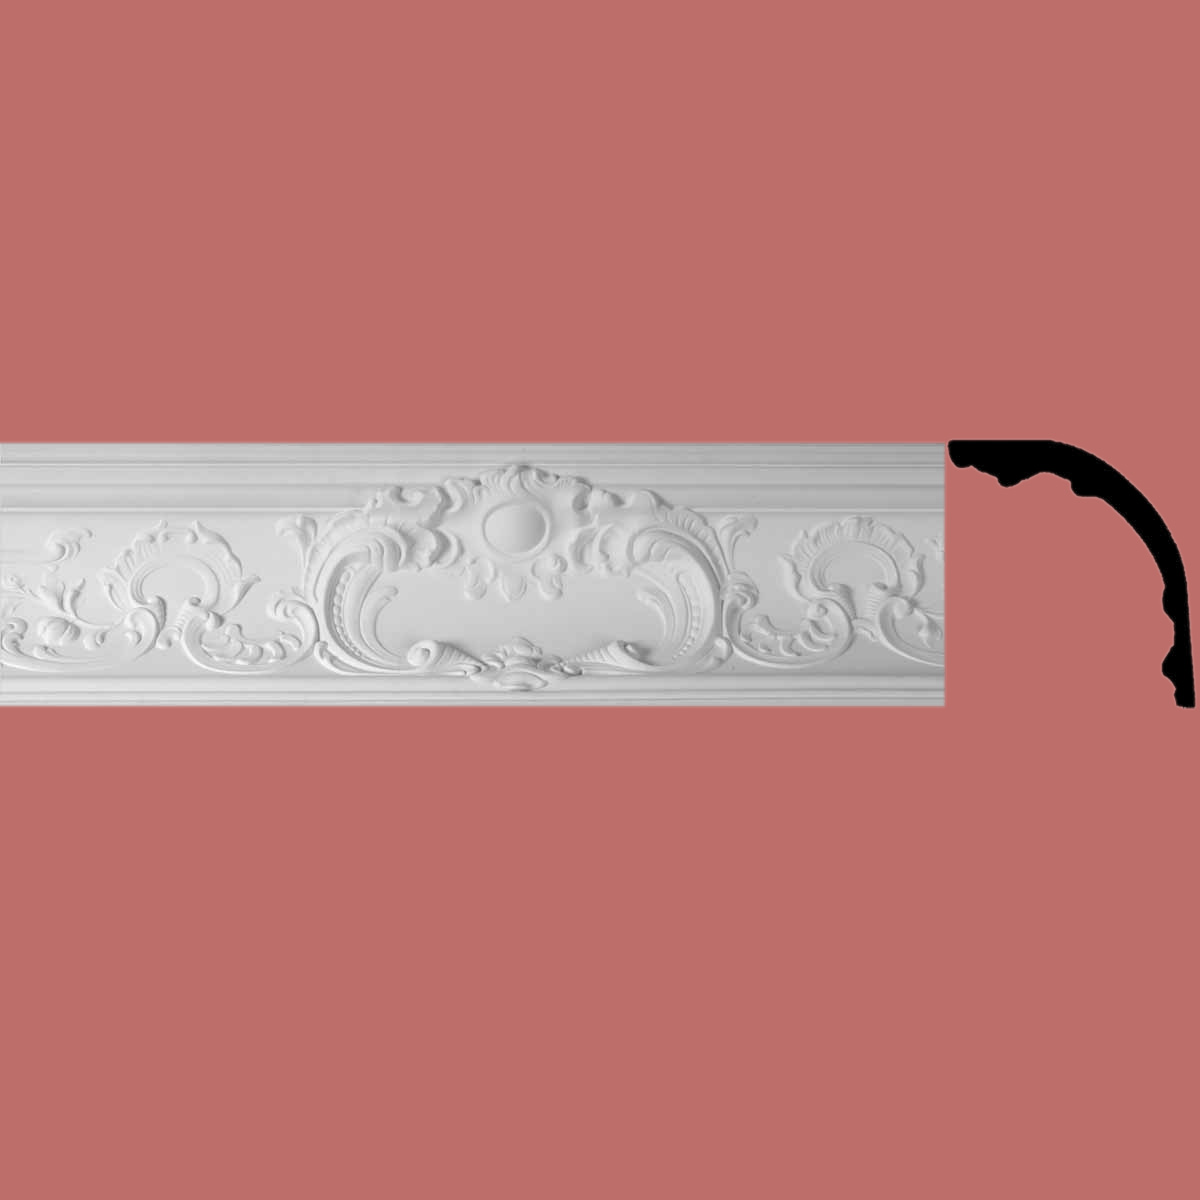 Cornice White Urethane Sample of 20408 19.5 Long Cornice Cornice Moulding Cornice Molding